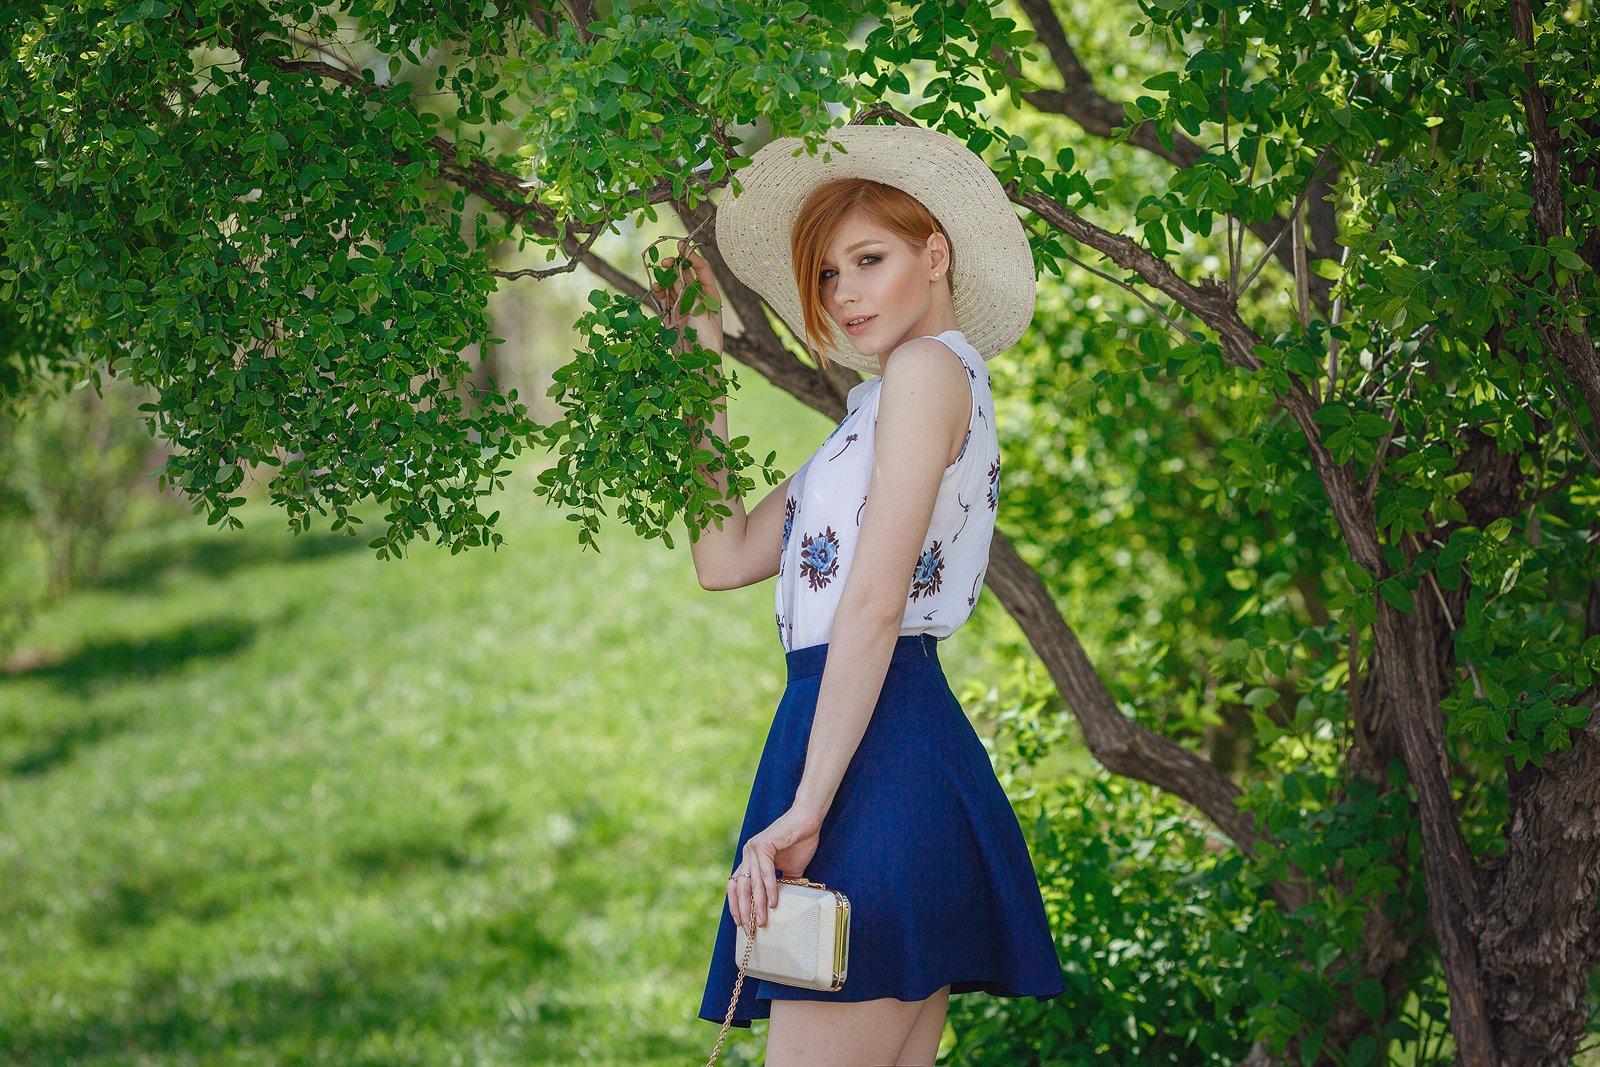 город, прогулка, девушка, весна, счастье, Москва, city, town, walk, woman, ginger, Елена Молчанова